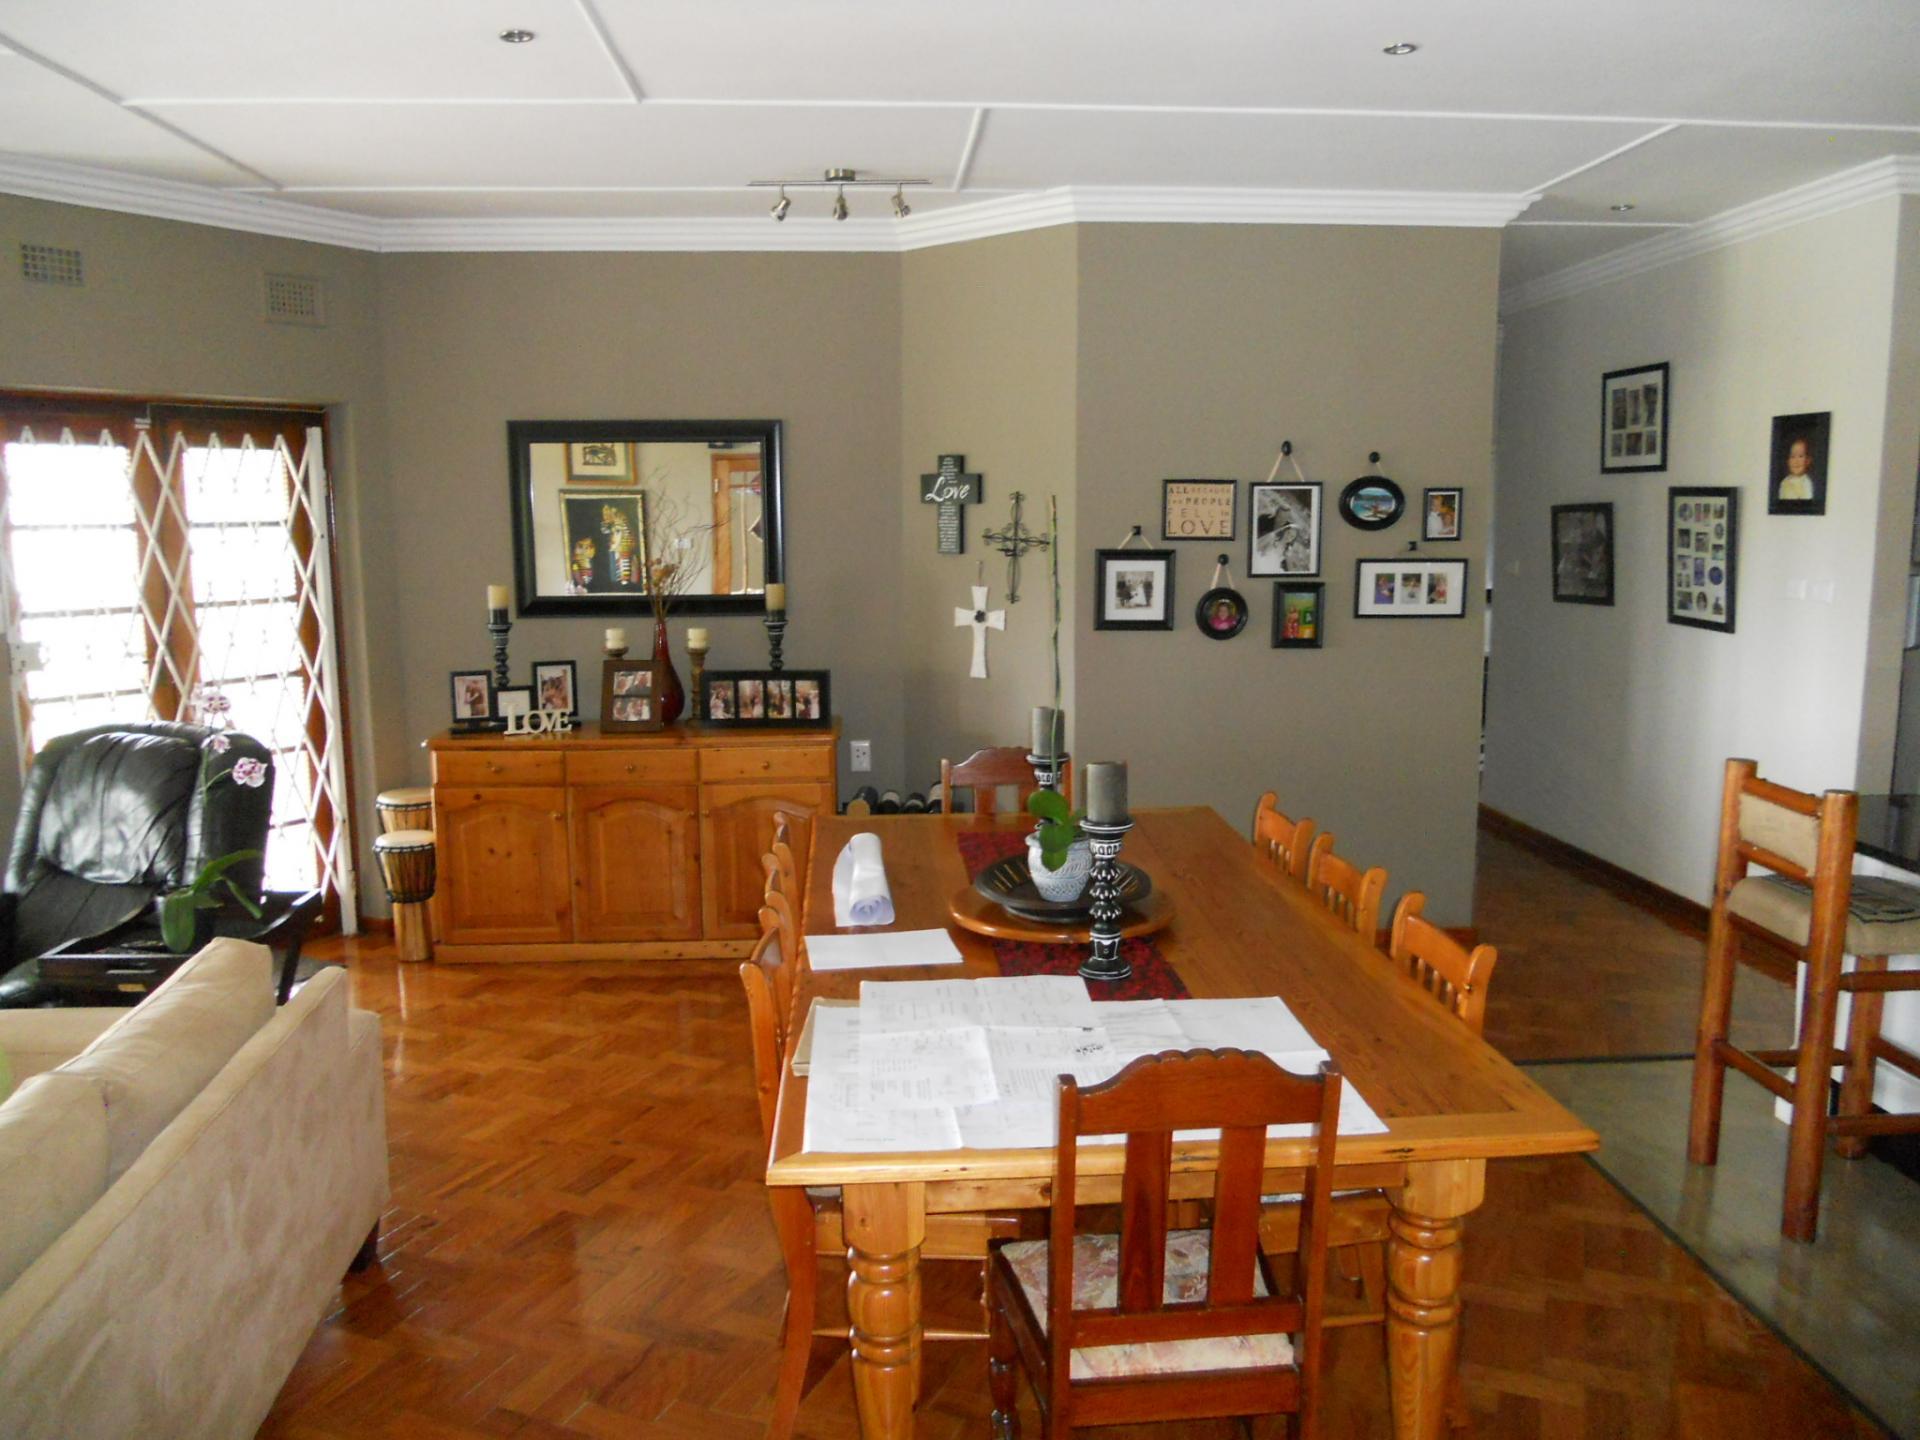 3 Bedroom House For Sale In Pietermaritzburg KZN